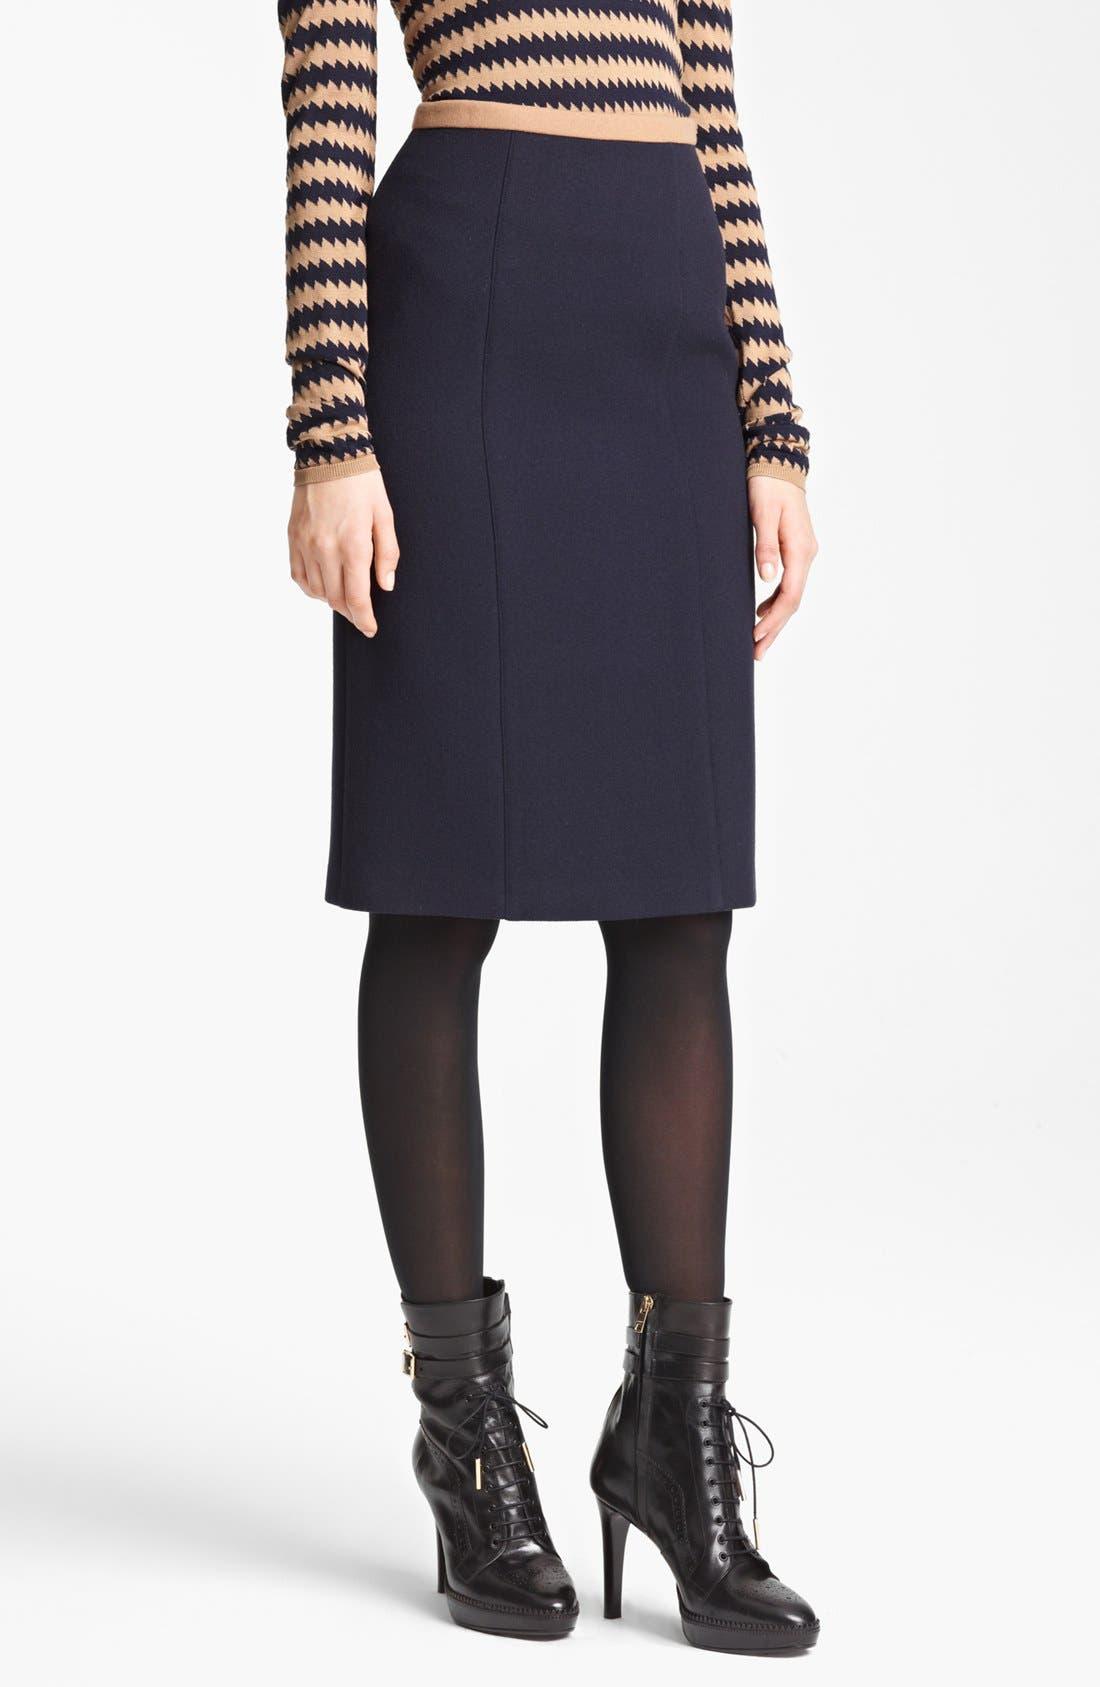 Alternate Image 1 Selected - Burberry Prorsum Contrast Waist Skirt